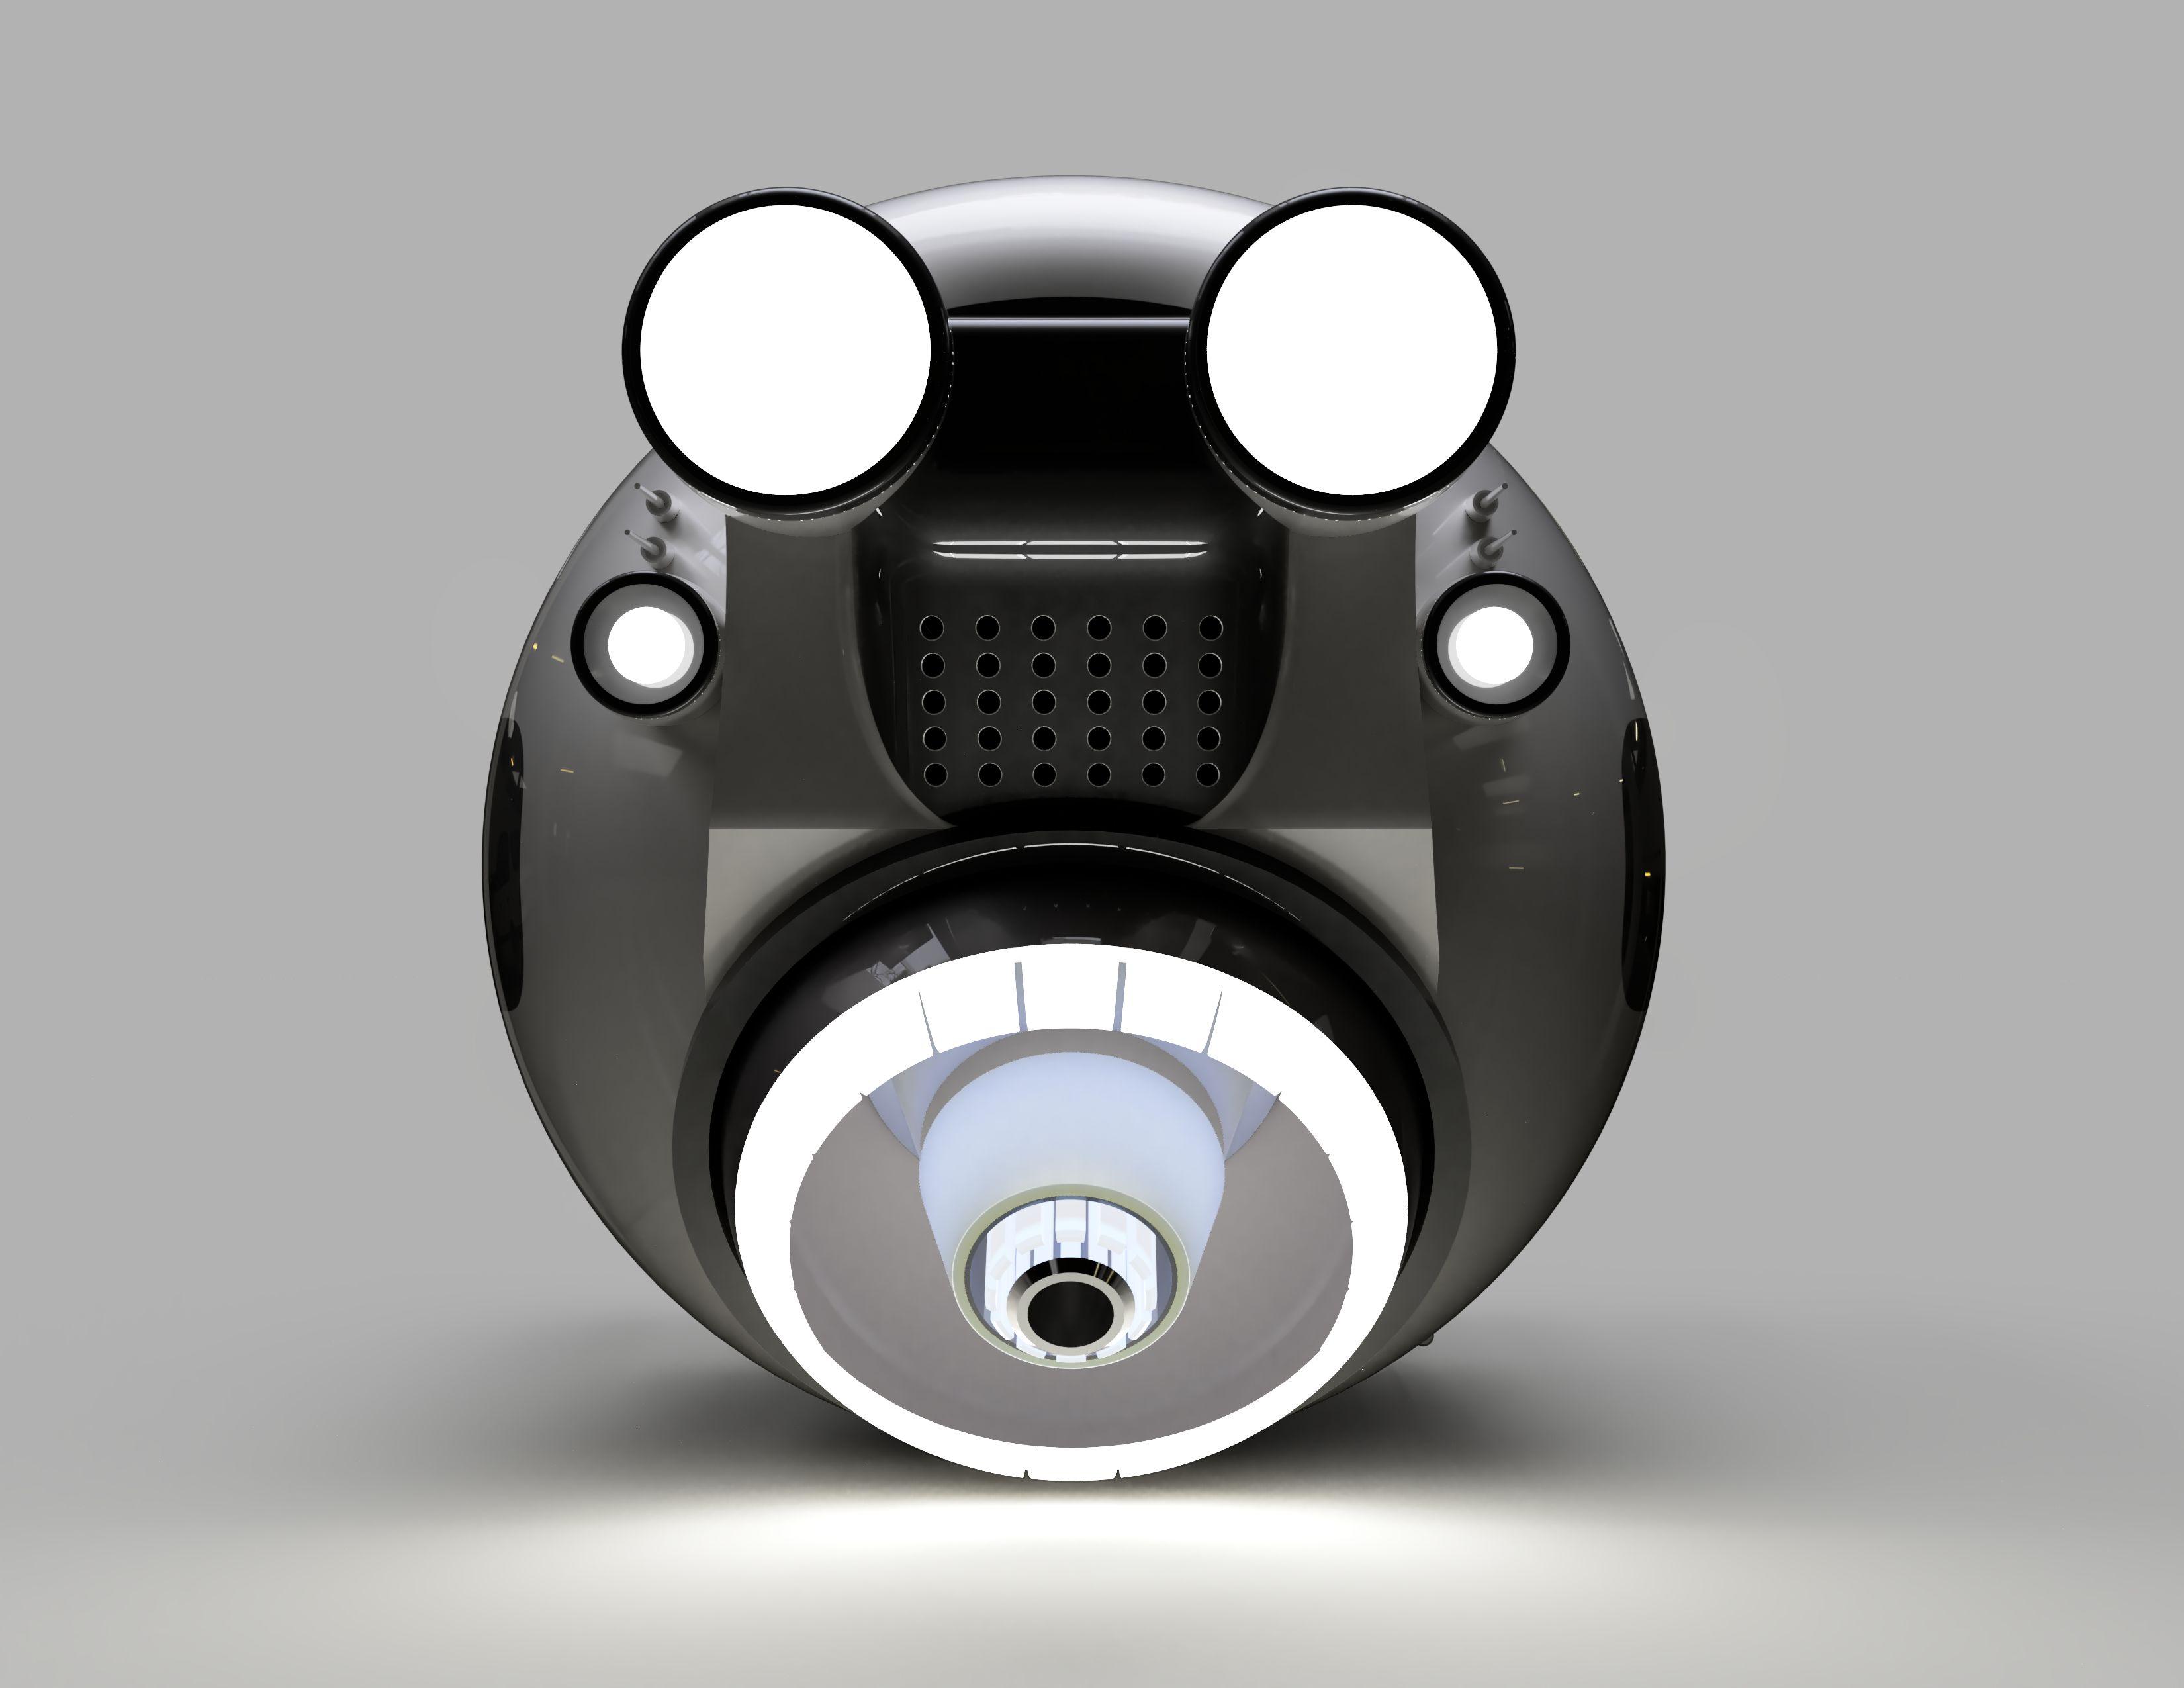 Dron-con-acabado-2019-dec-14-02-36-35am-000-customizedview25163144733-png-3500-3500